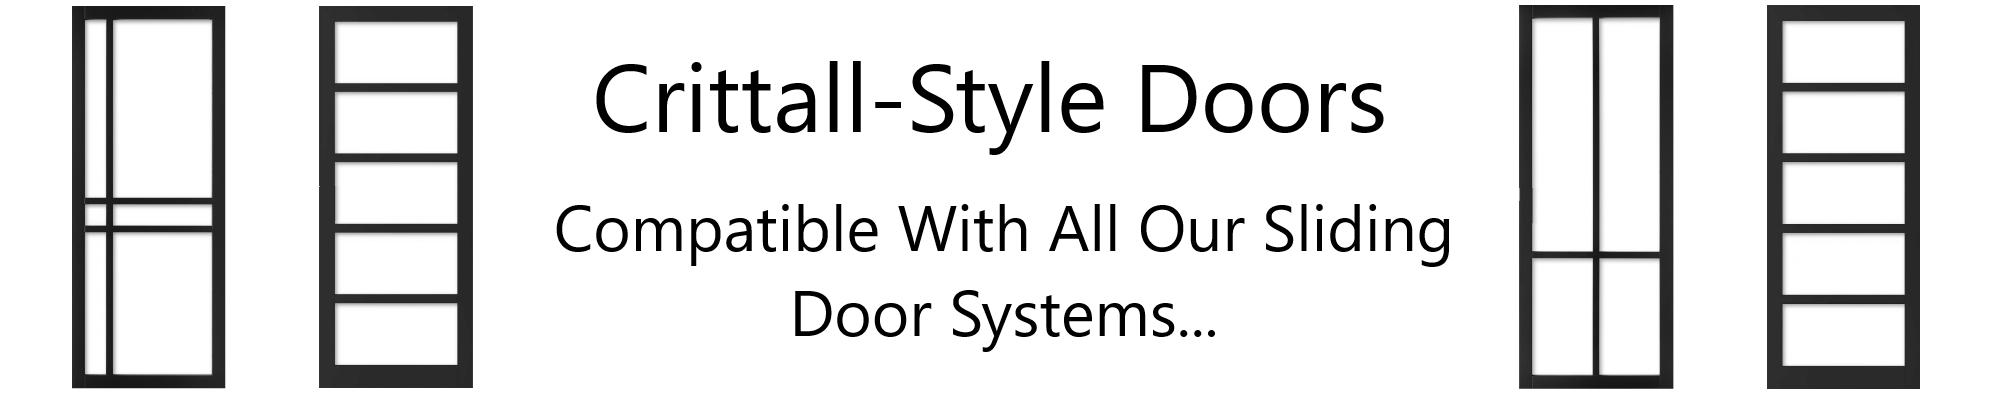 Crittall-Style Sliding Doors UK